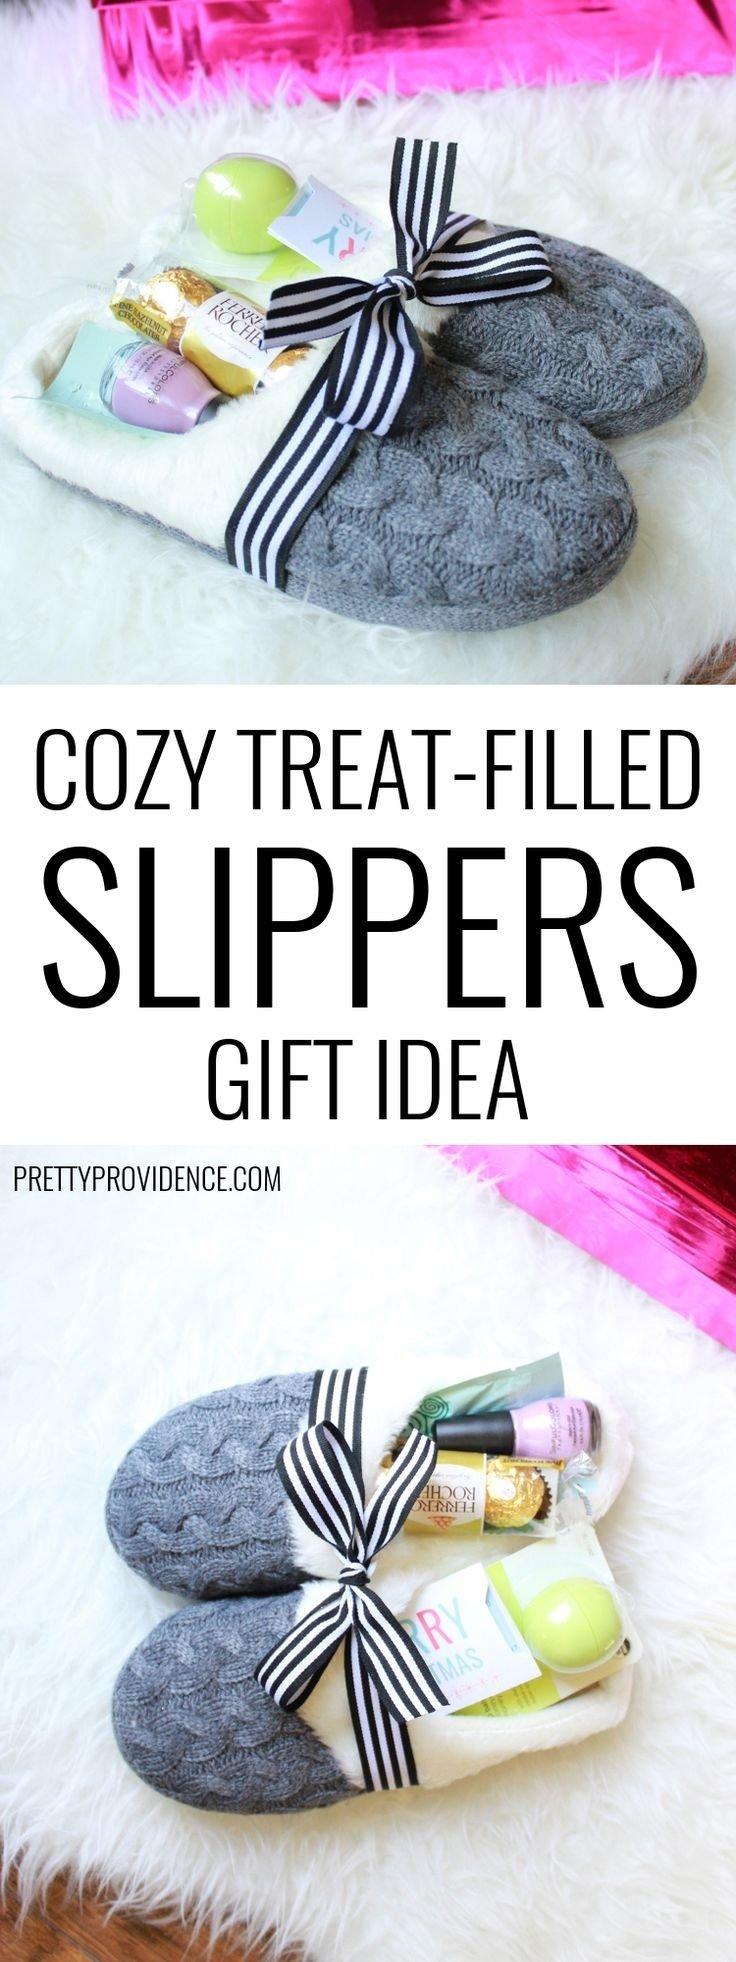 10 Amazing Good Gift Ideas For Your Girlfriend les 130 meilleures images du tableau gifts gift ideas sur 2021